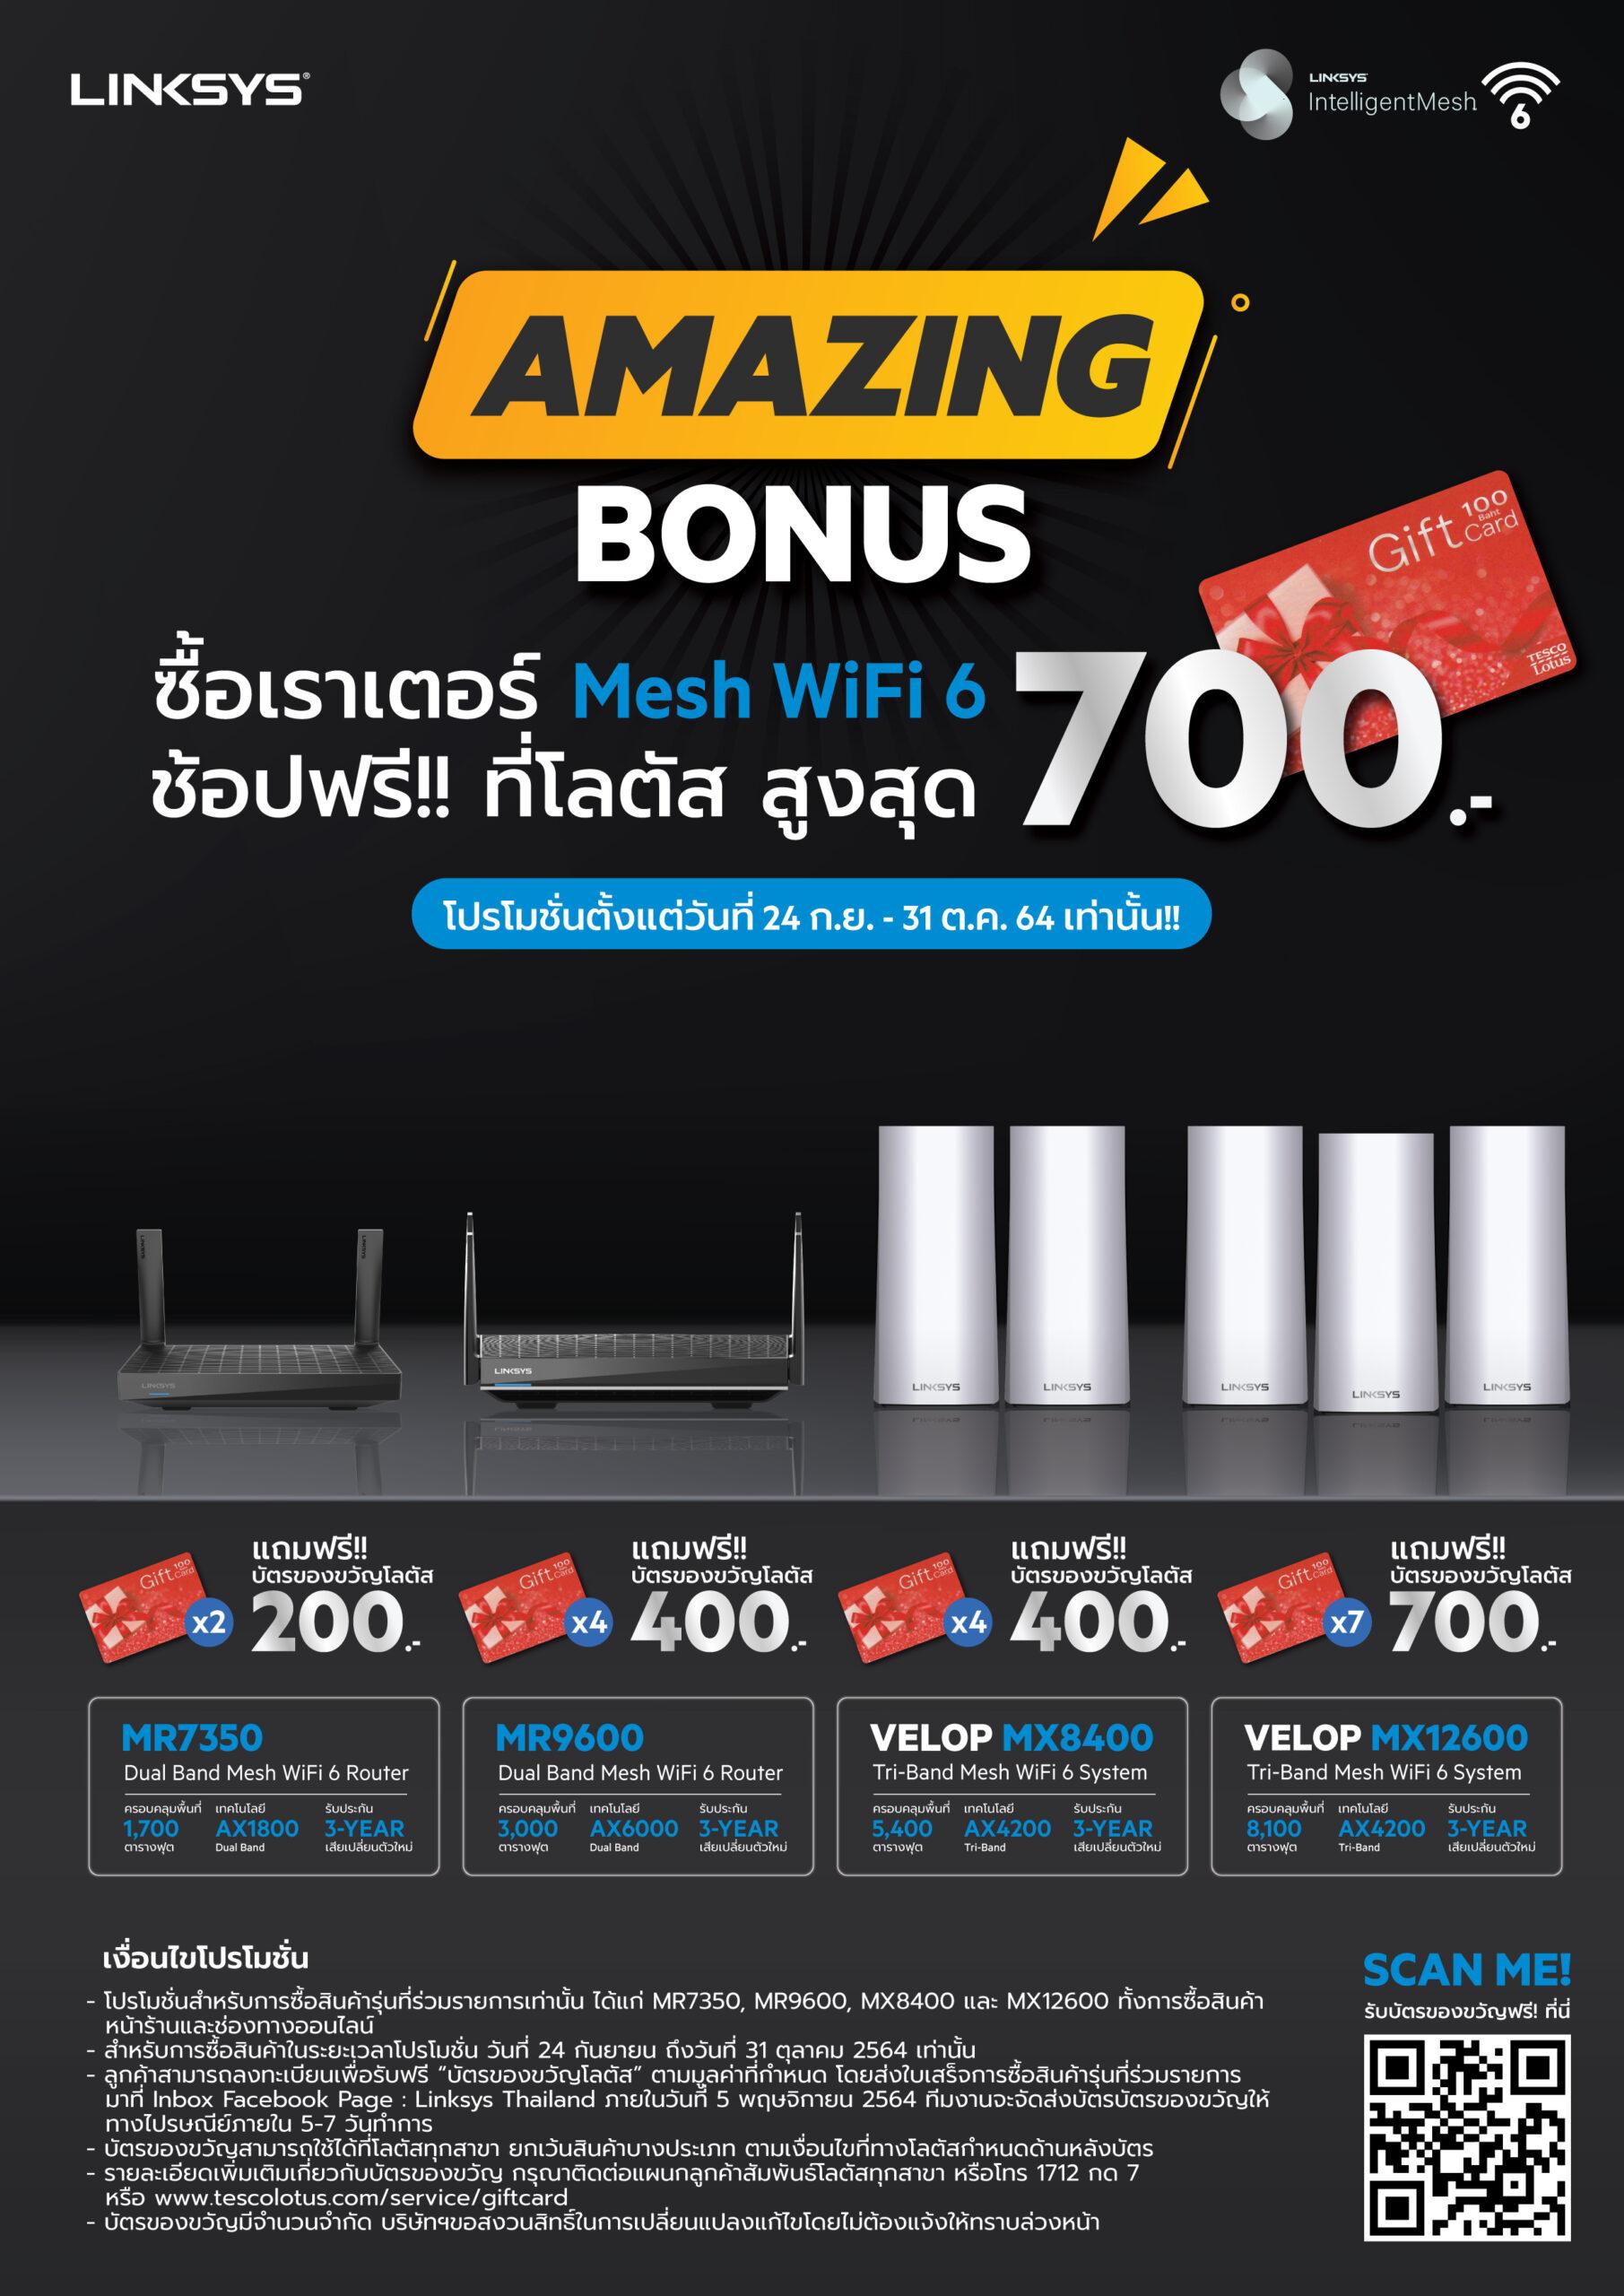 Amazing Bonus - ซื้อเราเตอร์ Mesh WiFi 6 ช้อปฟรี!!! ที่โลตัส สูงสุด 700 บาท